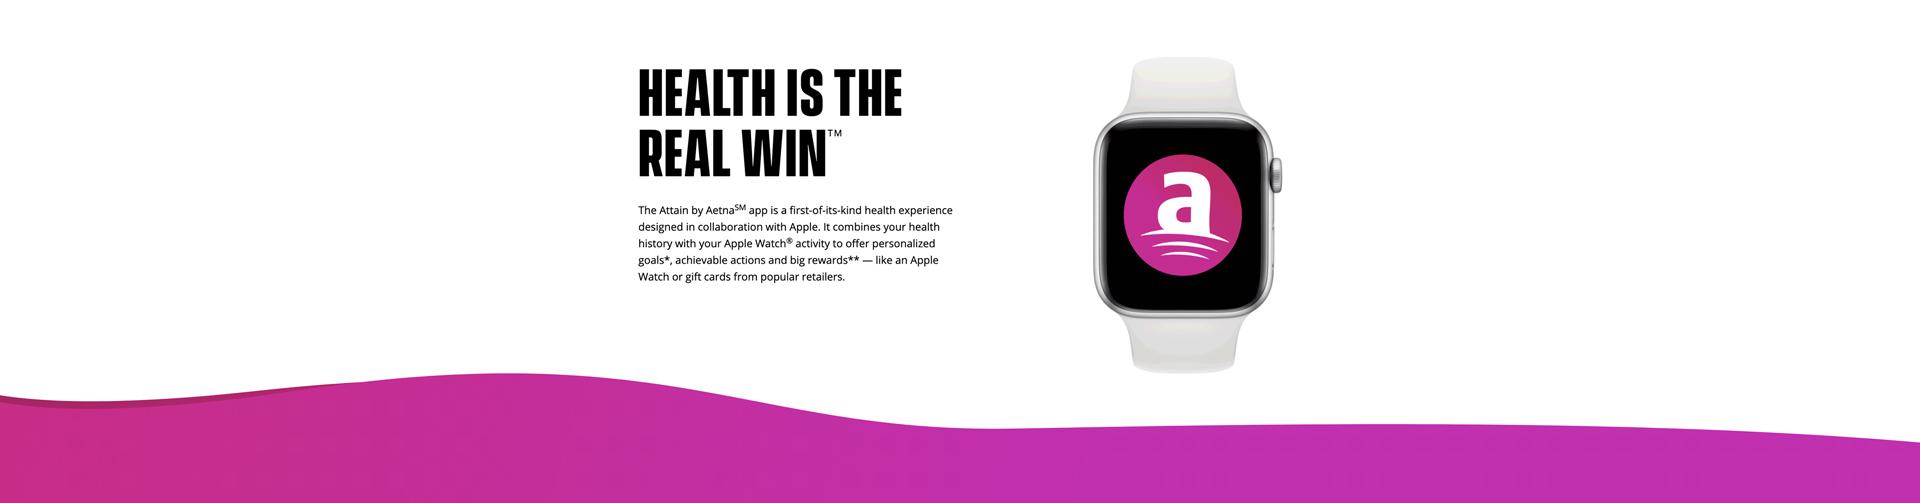 Attain Wellness App Image